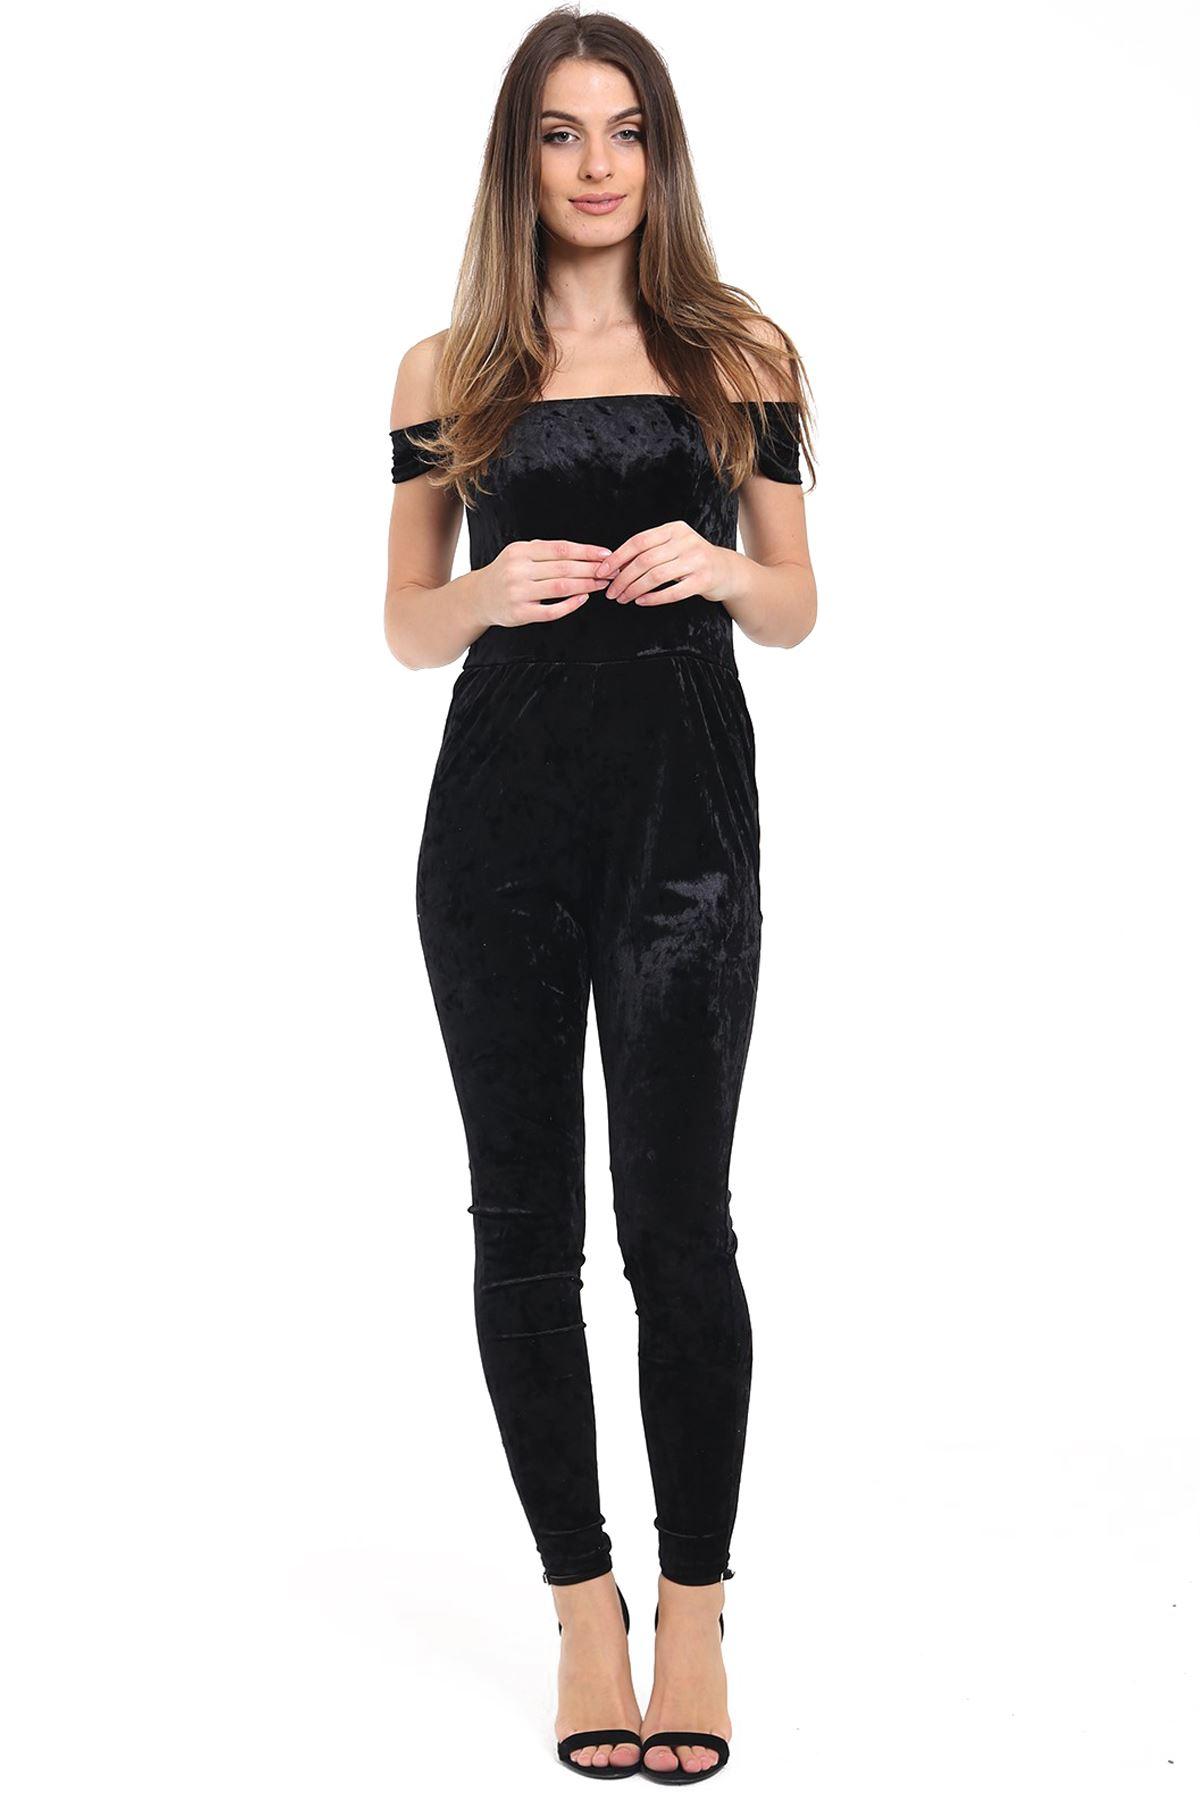 bdb2060d9f7 Ladies crushed velvet velour off shoulder stretch bardot jpg 1200x1800 Velour  jumpsuits for women